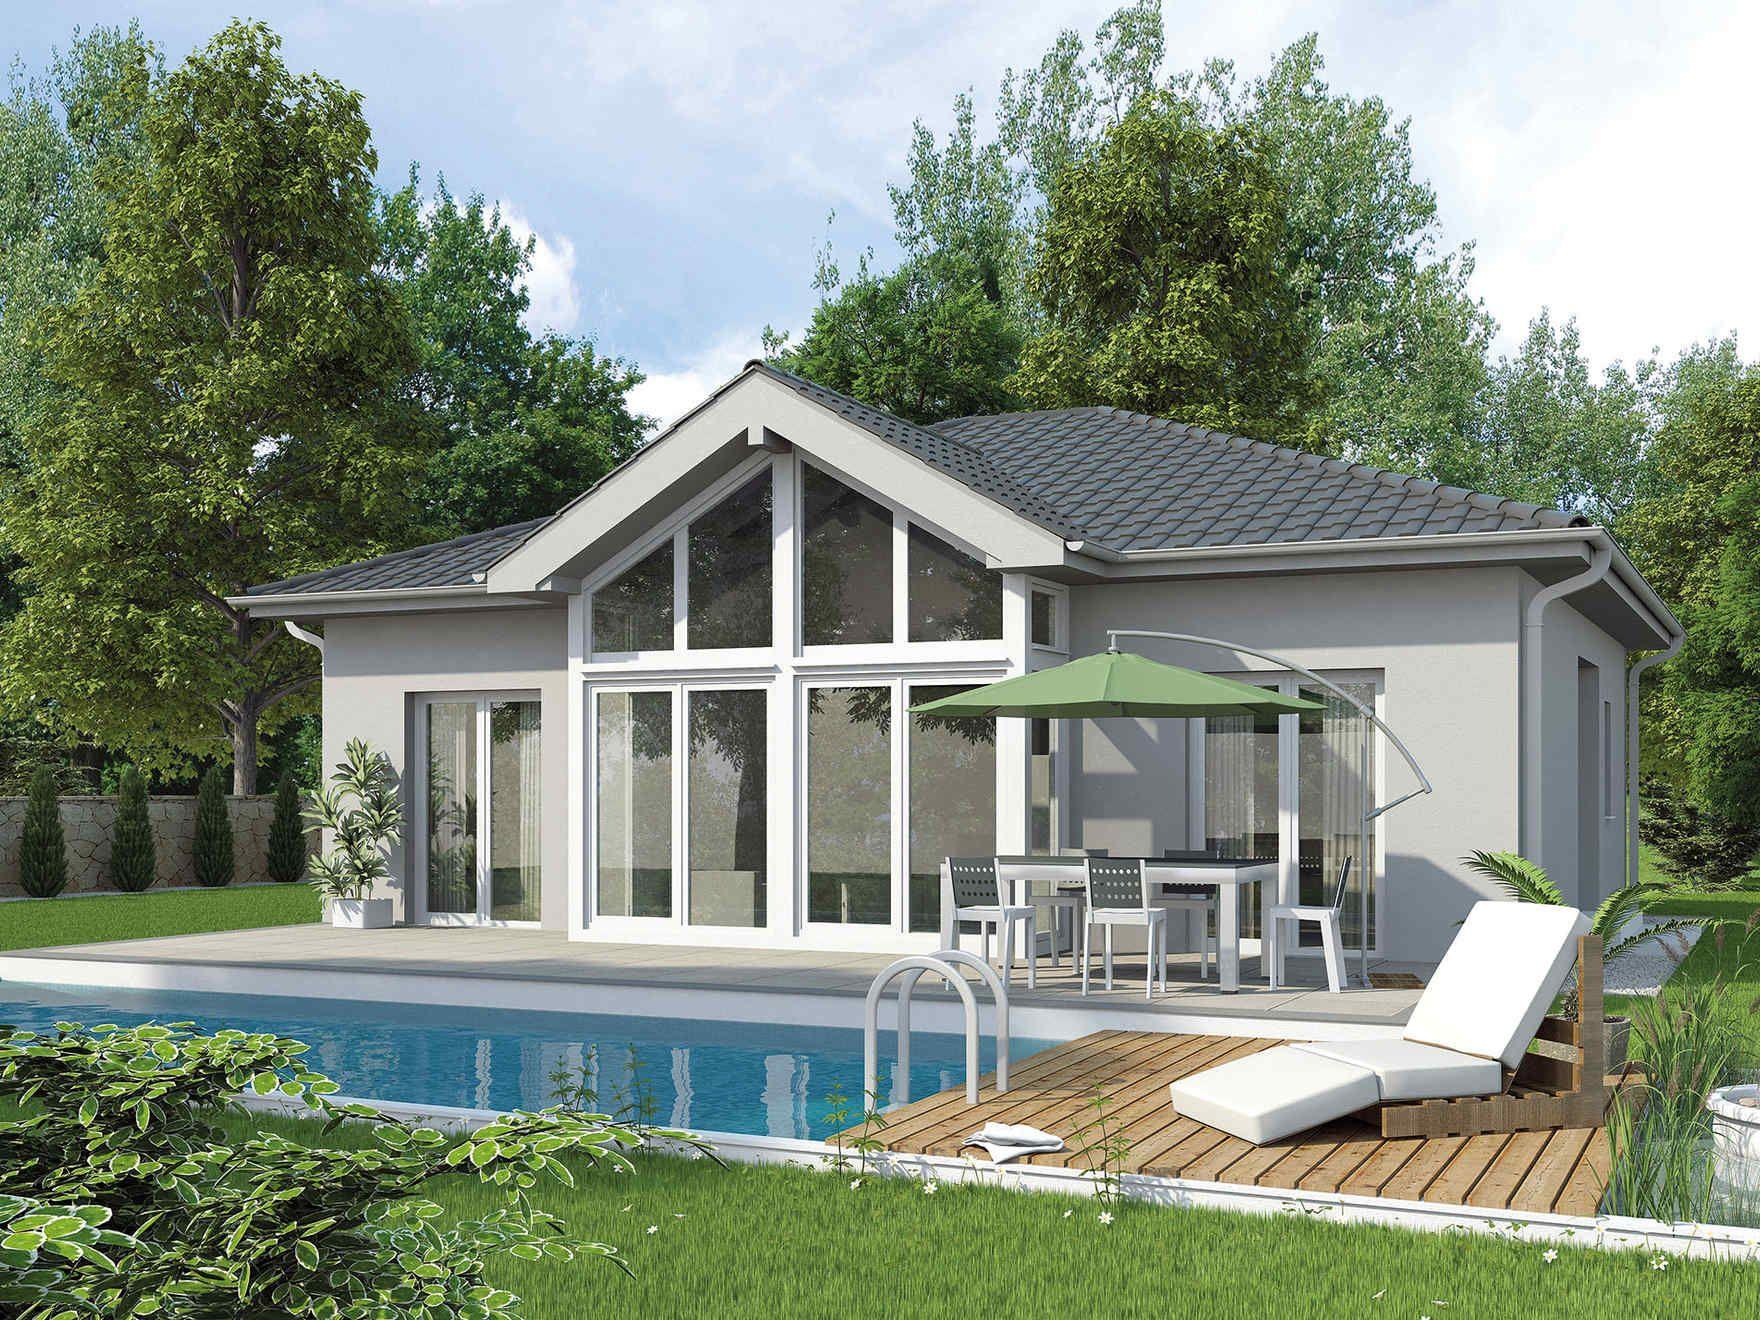 vario haus bungalow e98 gibtdemlebeneinzuhause einfamilienhaus fertighaus fertigteilhaus. Black Bedroom Furniture Sets. Home Design Ideas